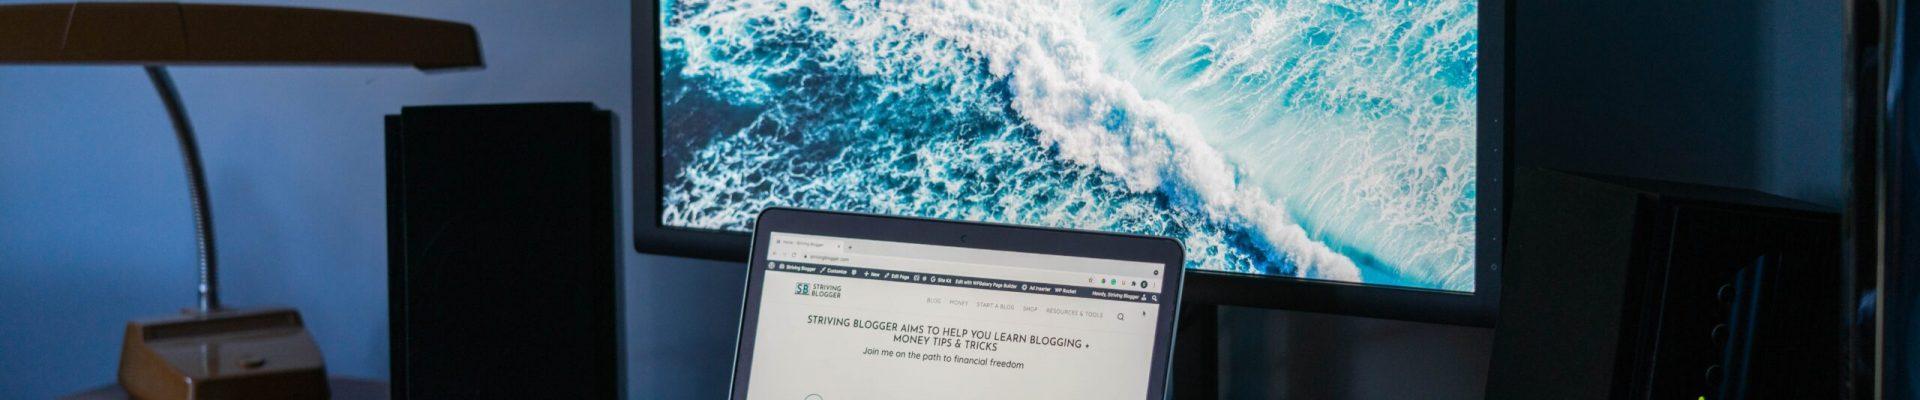 striving-blogger-HBZ5o1k8g6o-unsplash